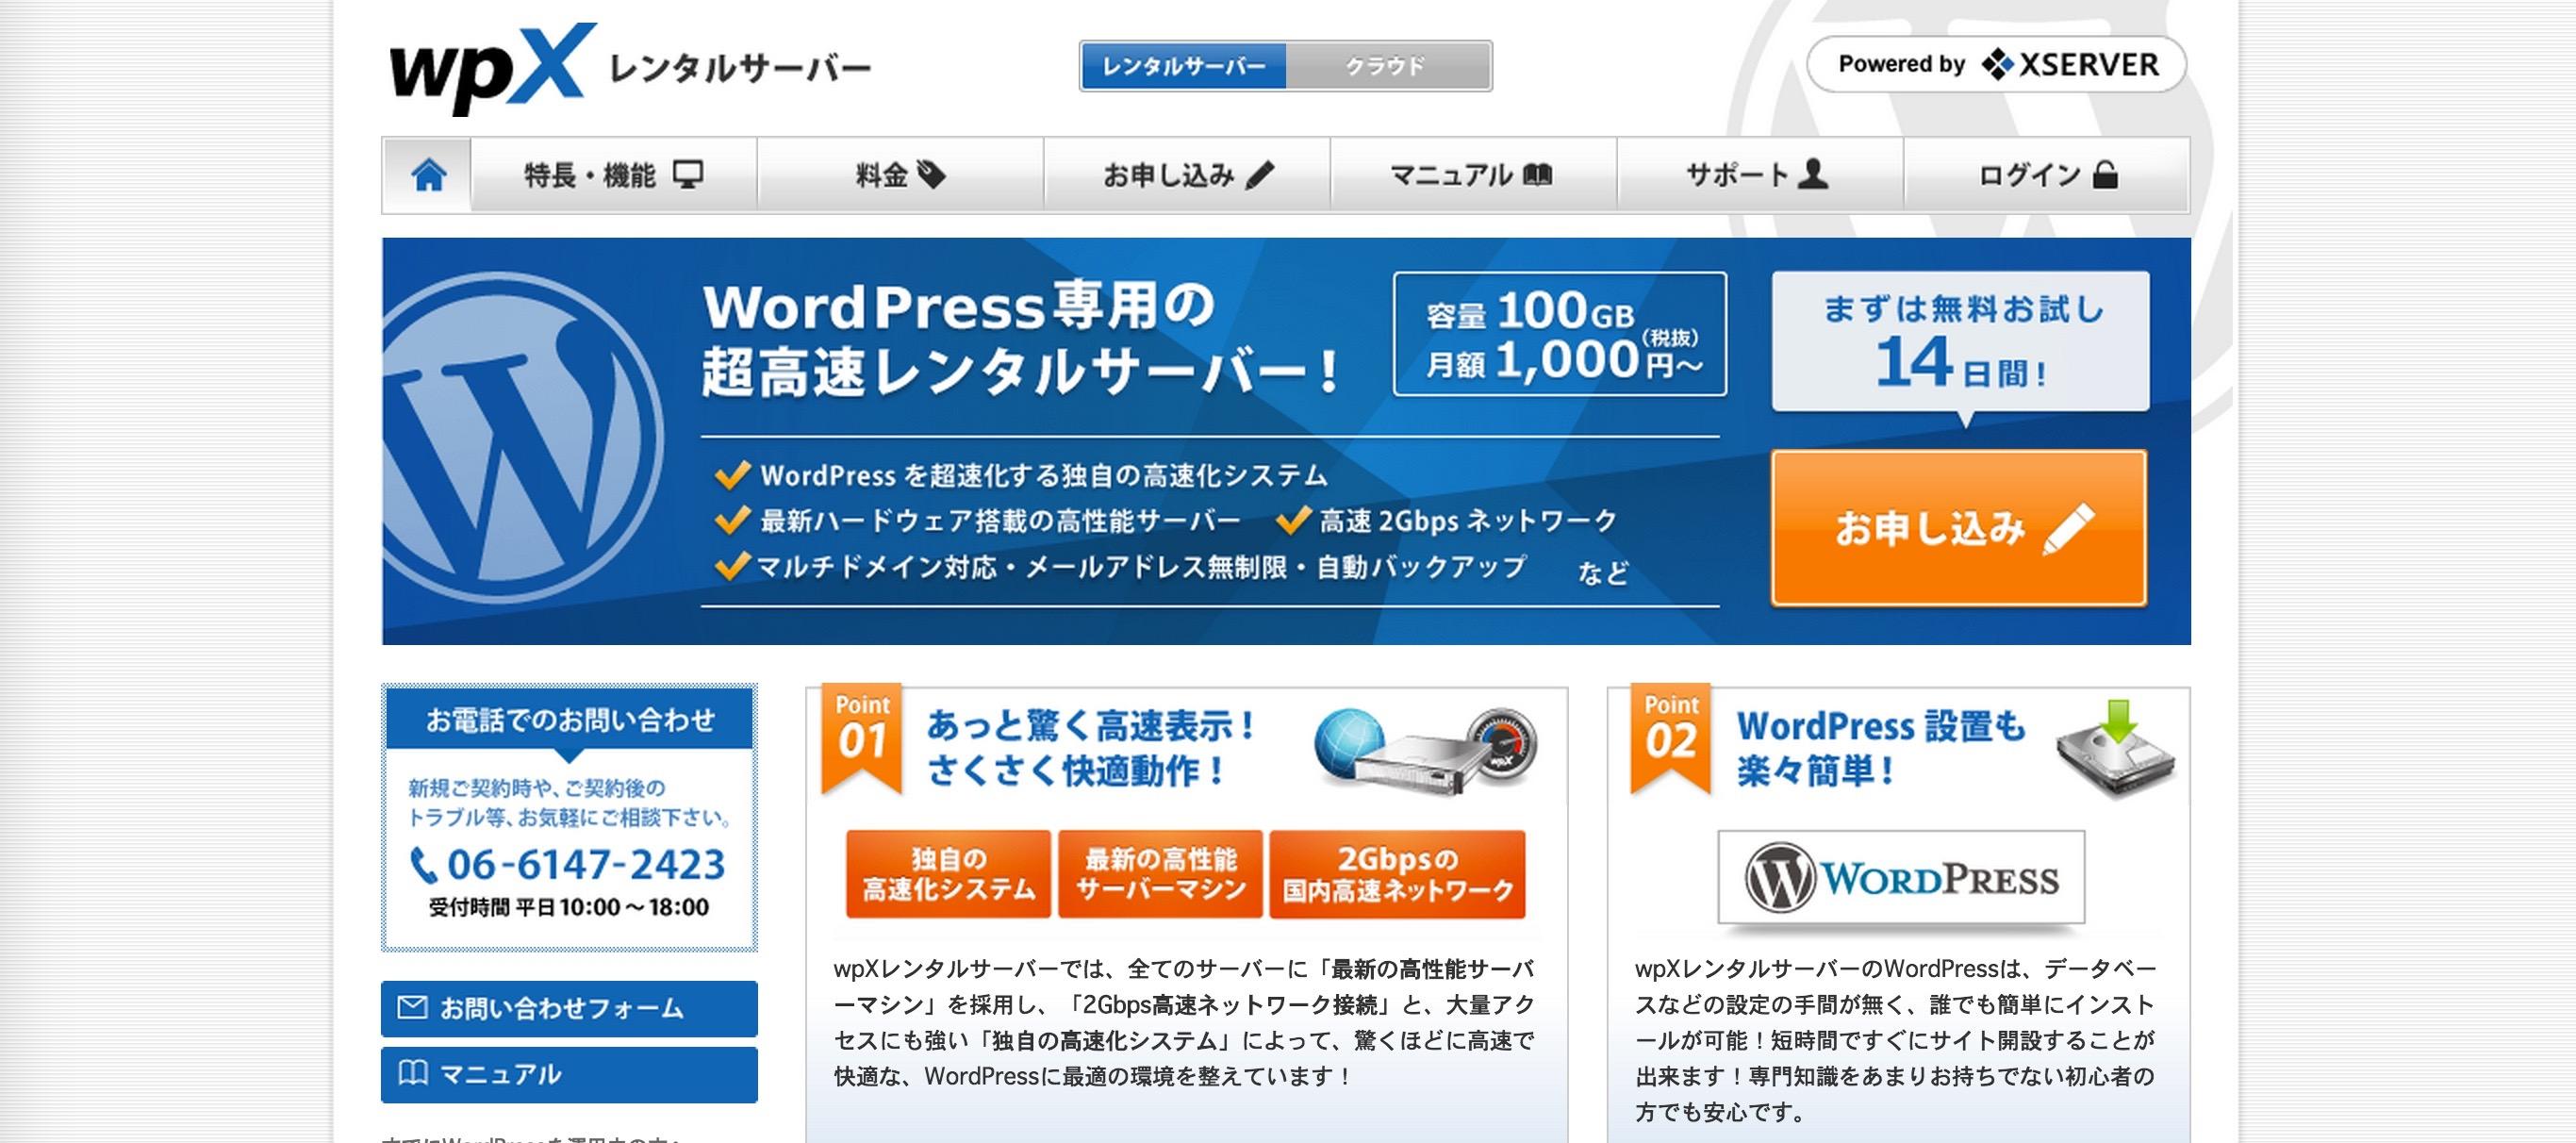 WordPress専用の超高速レンタルサーバー!_wpX_ダブリューピーエックス_レンタルサーバー